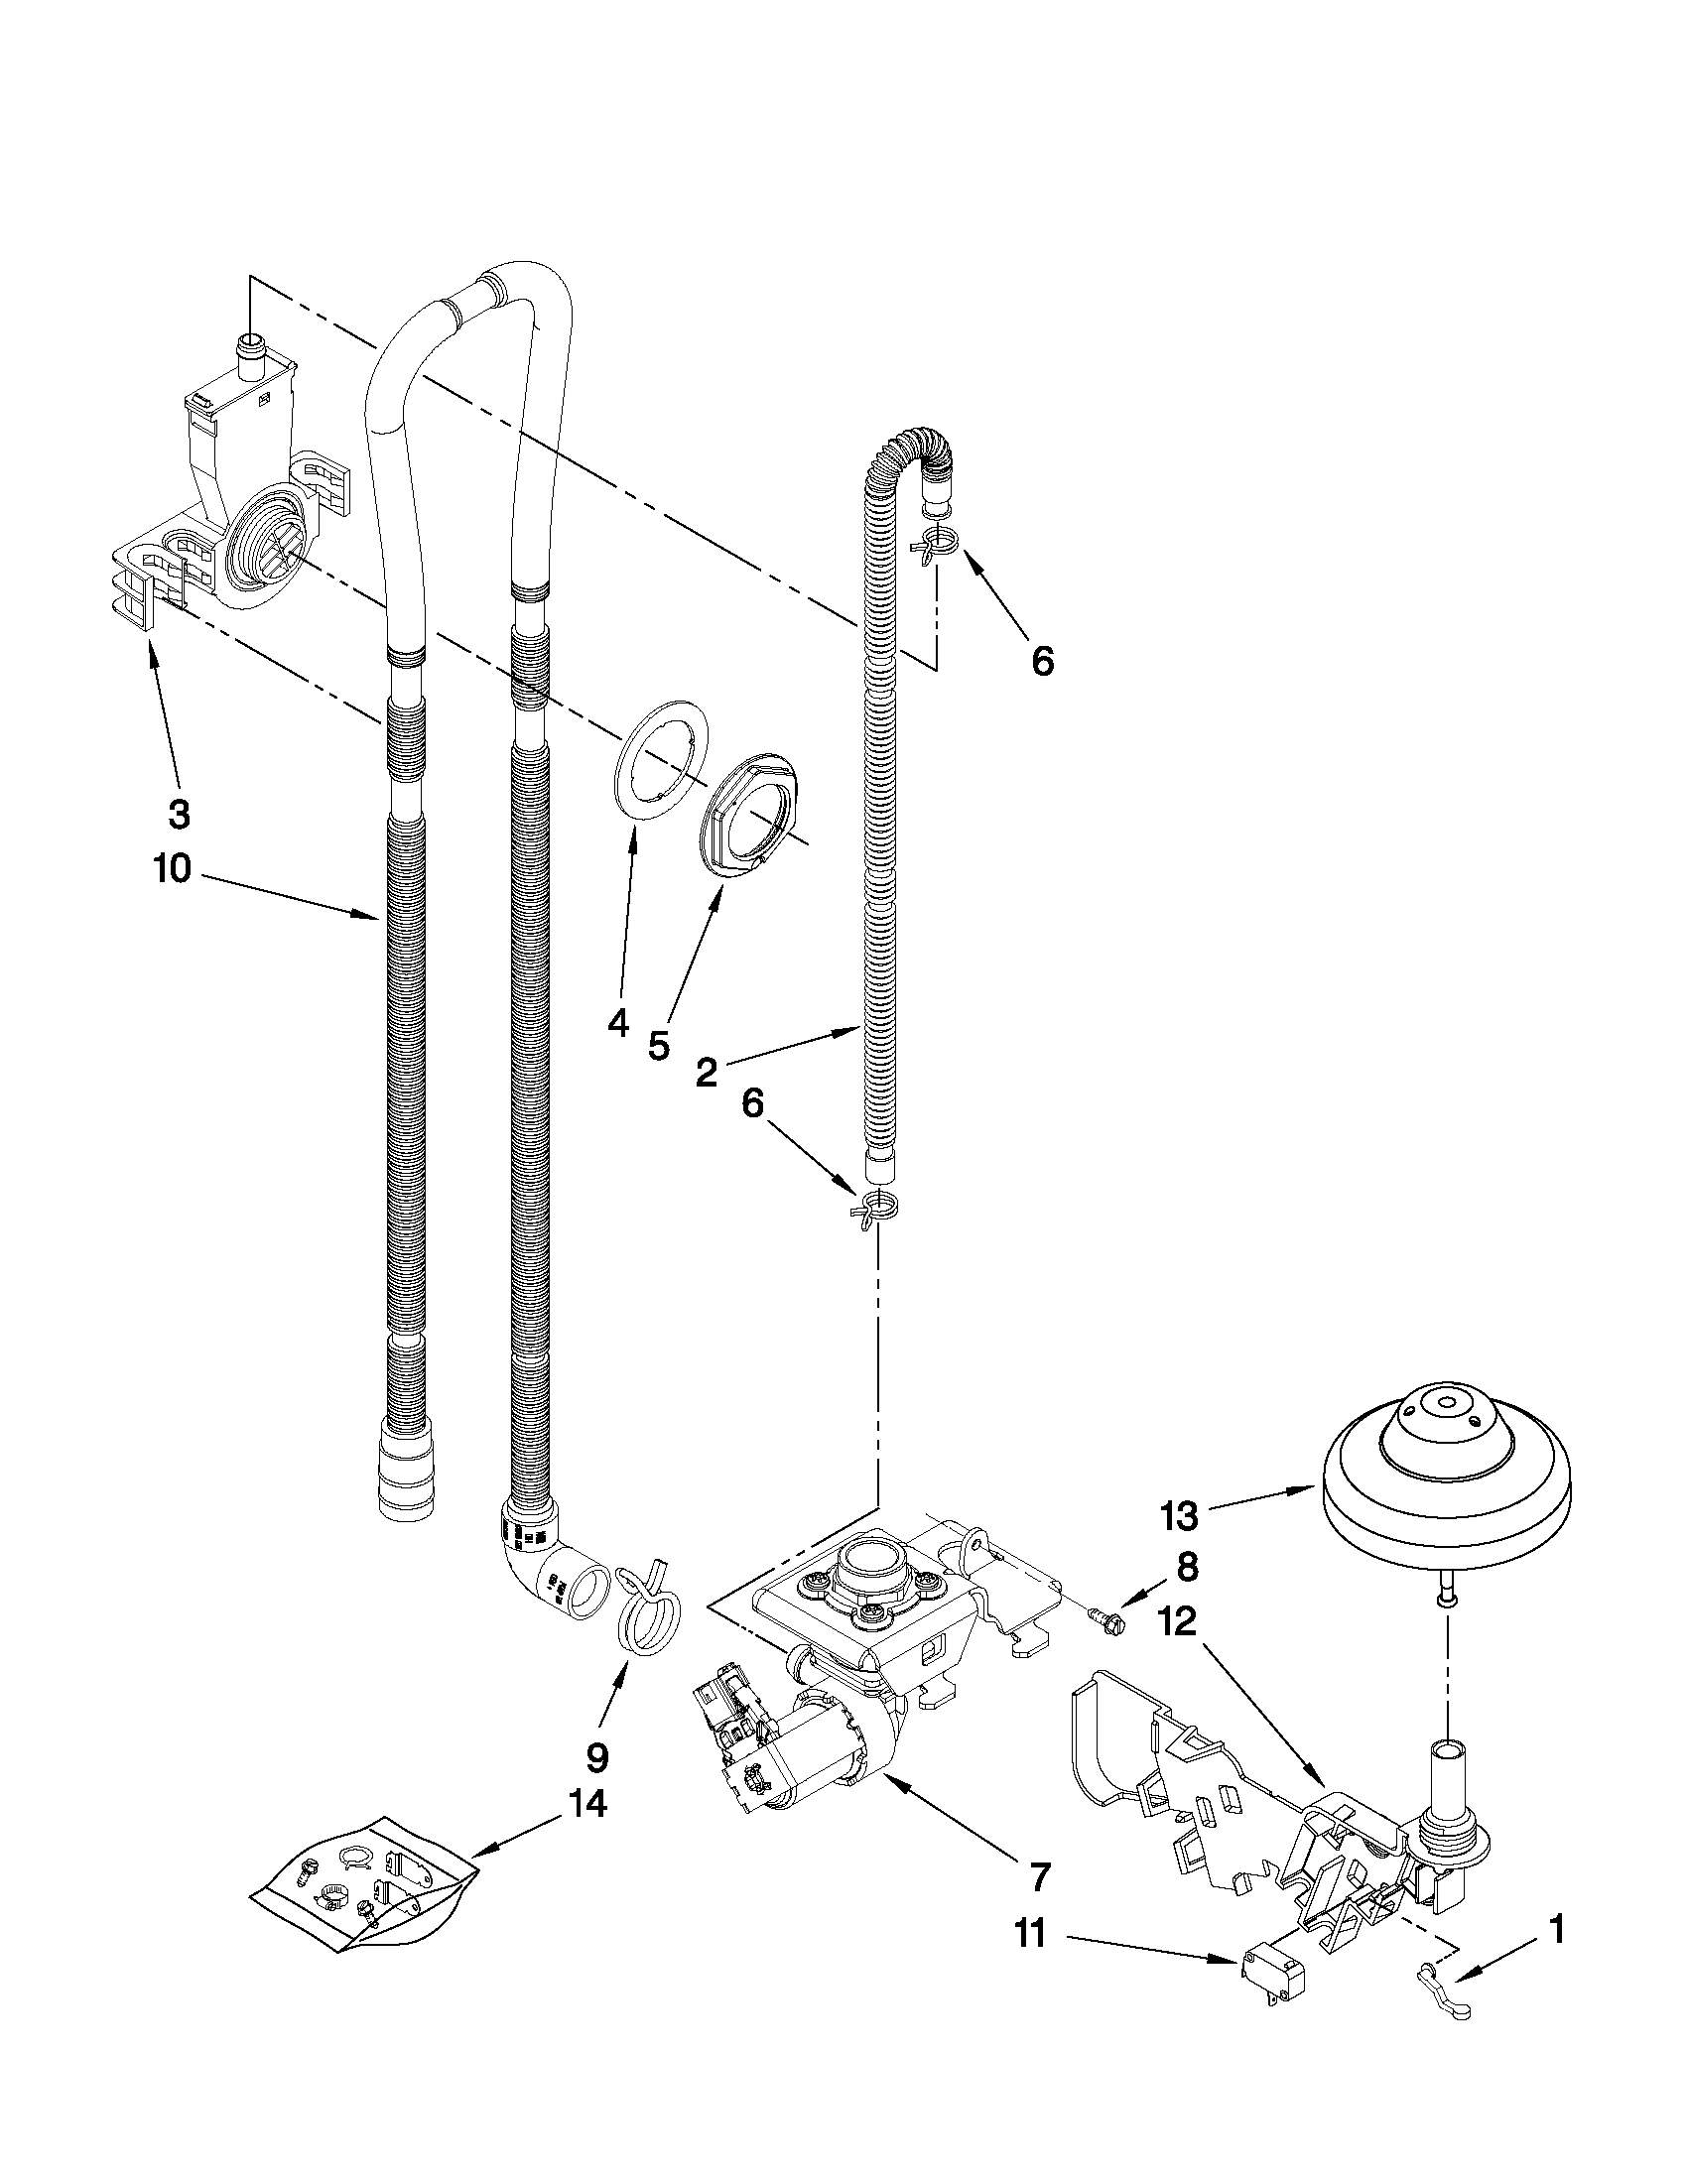 Maytag Undercounter Dishwasher Parts Model Mdbh969aws1